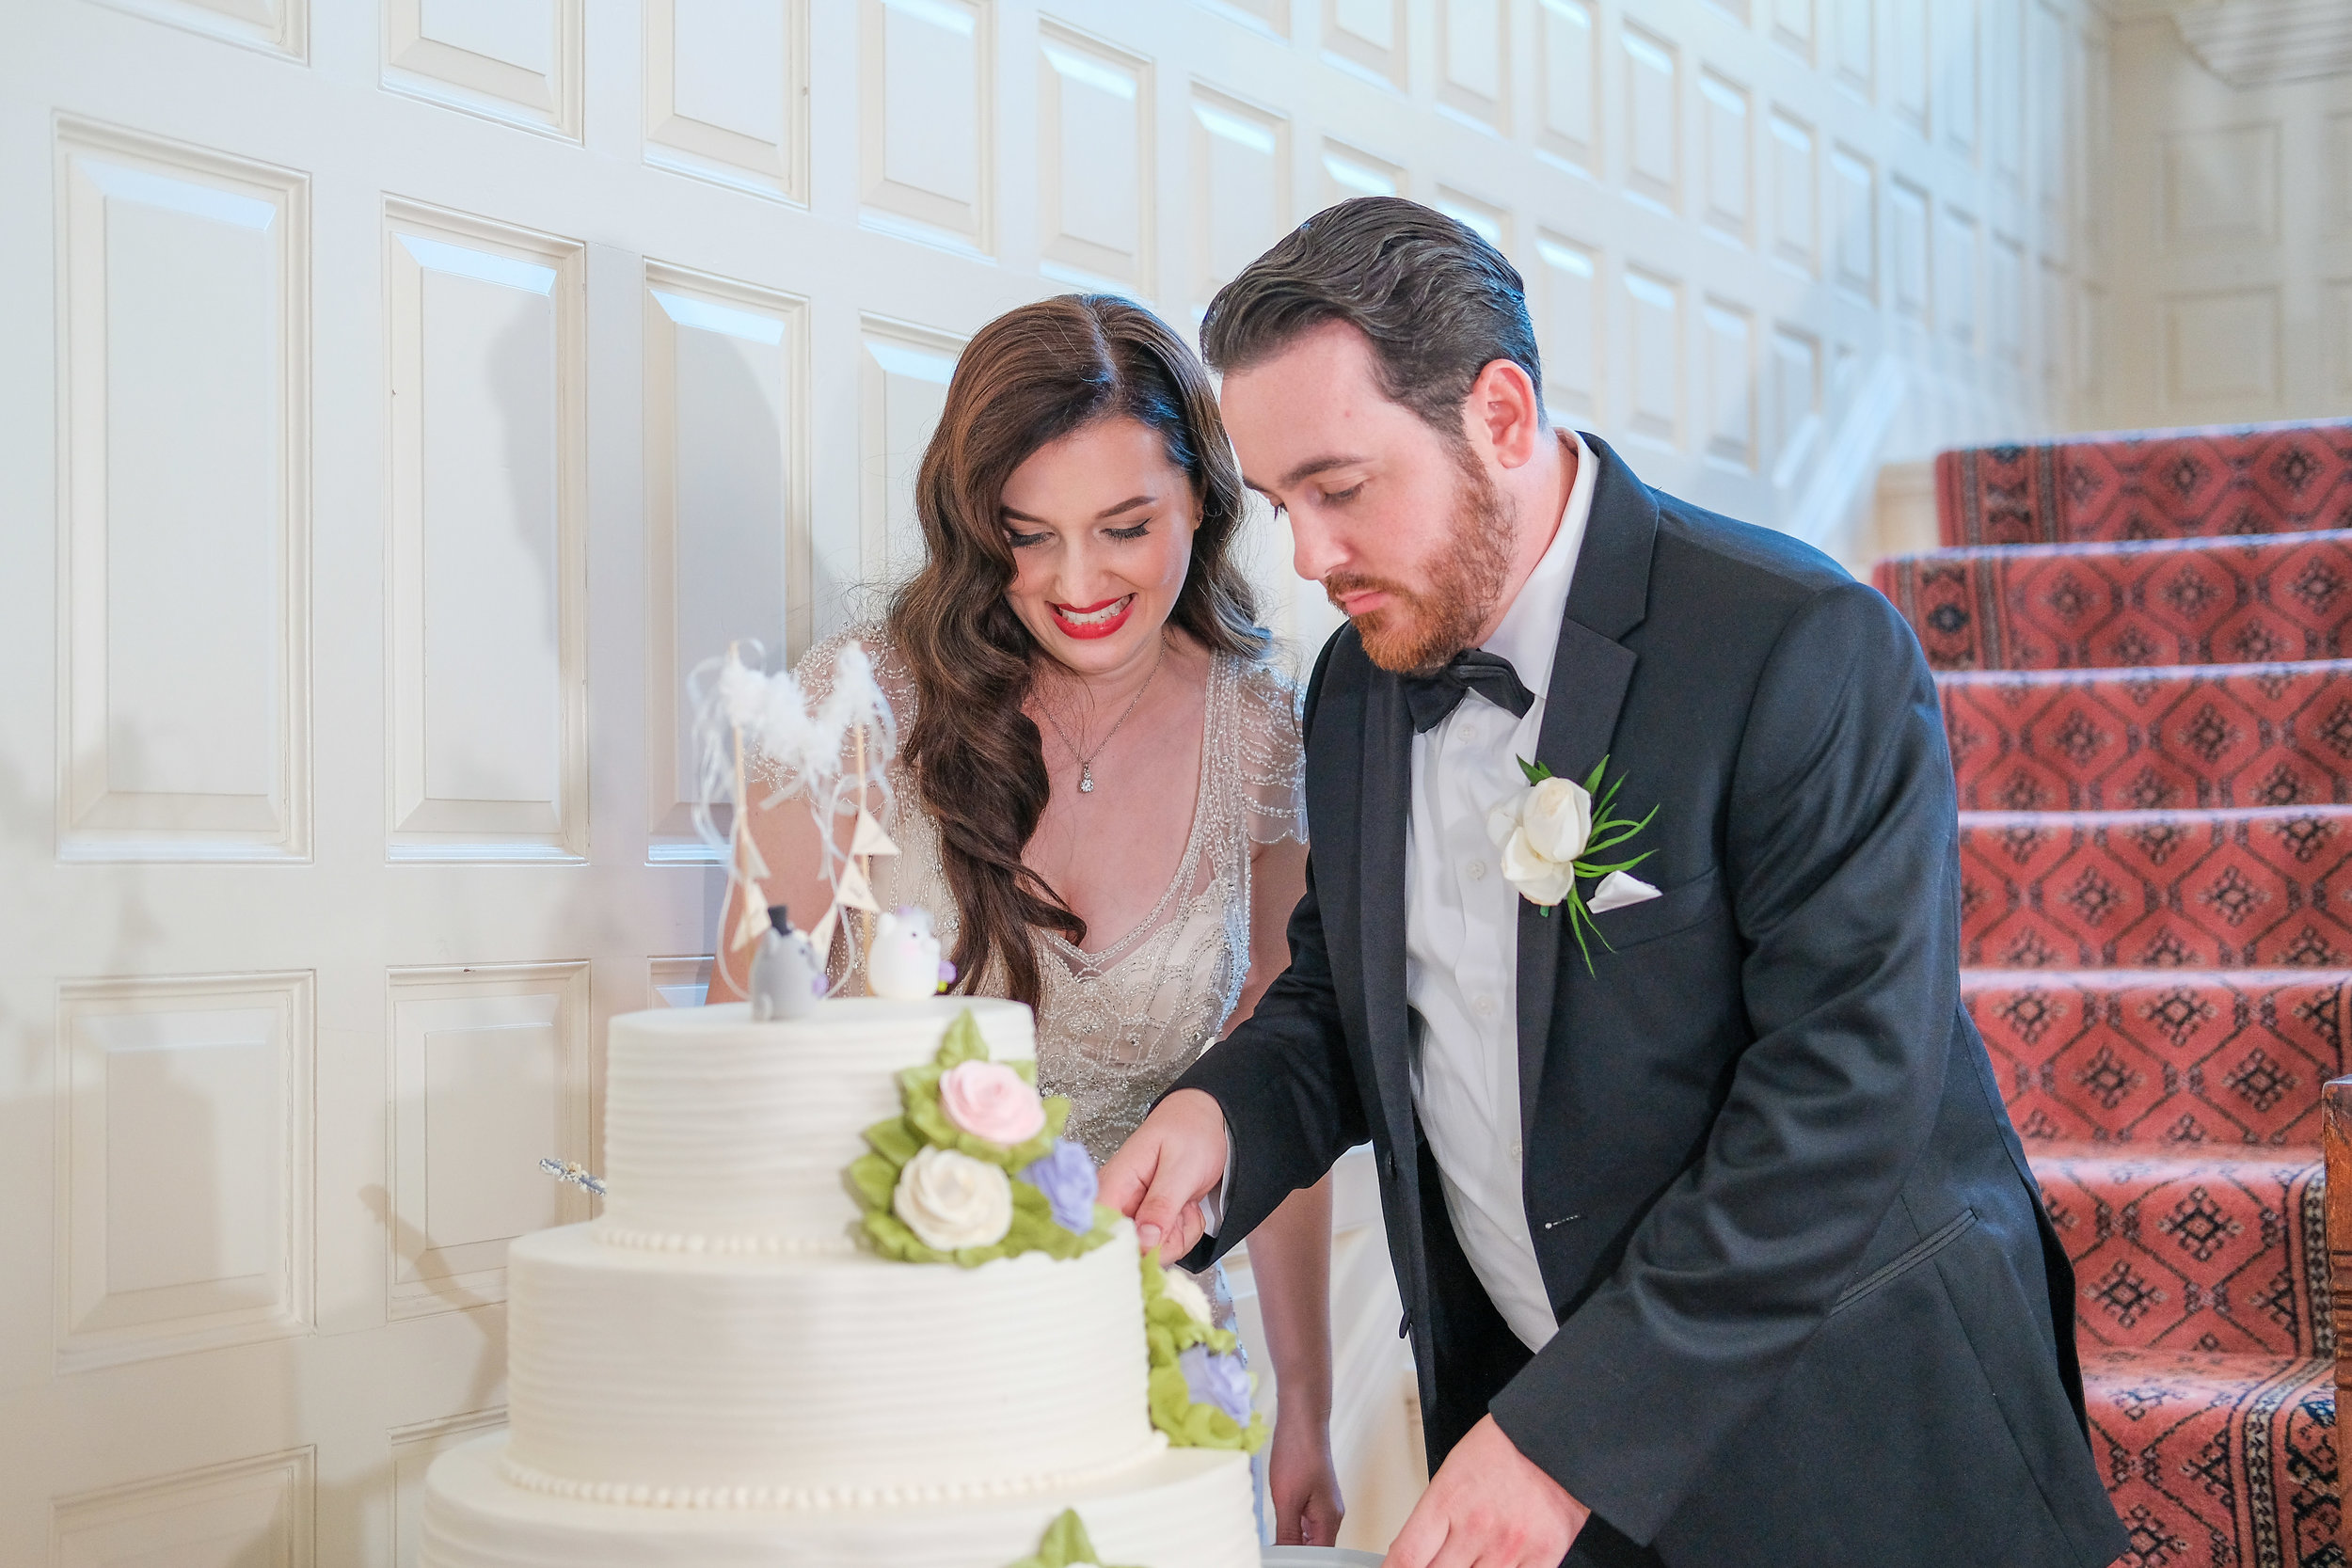 lyman-estate-wedding-photography-59.jpg